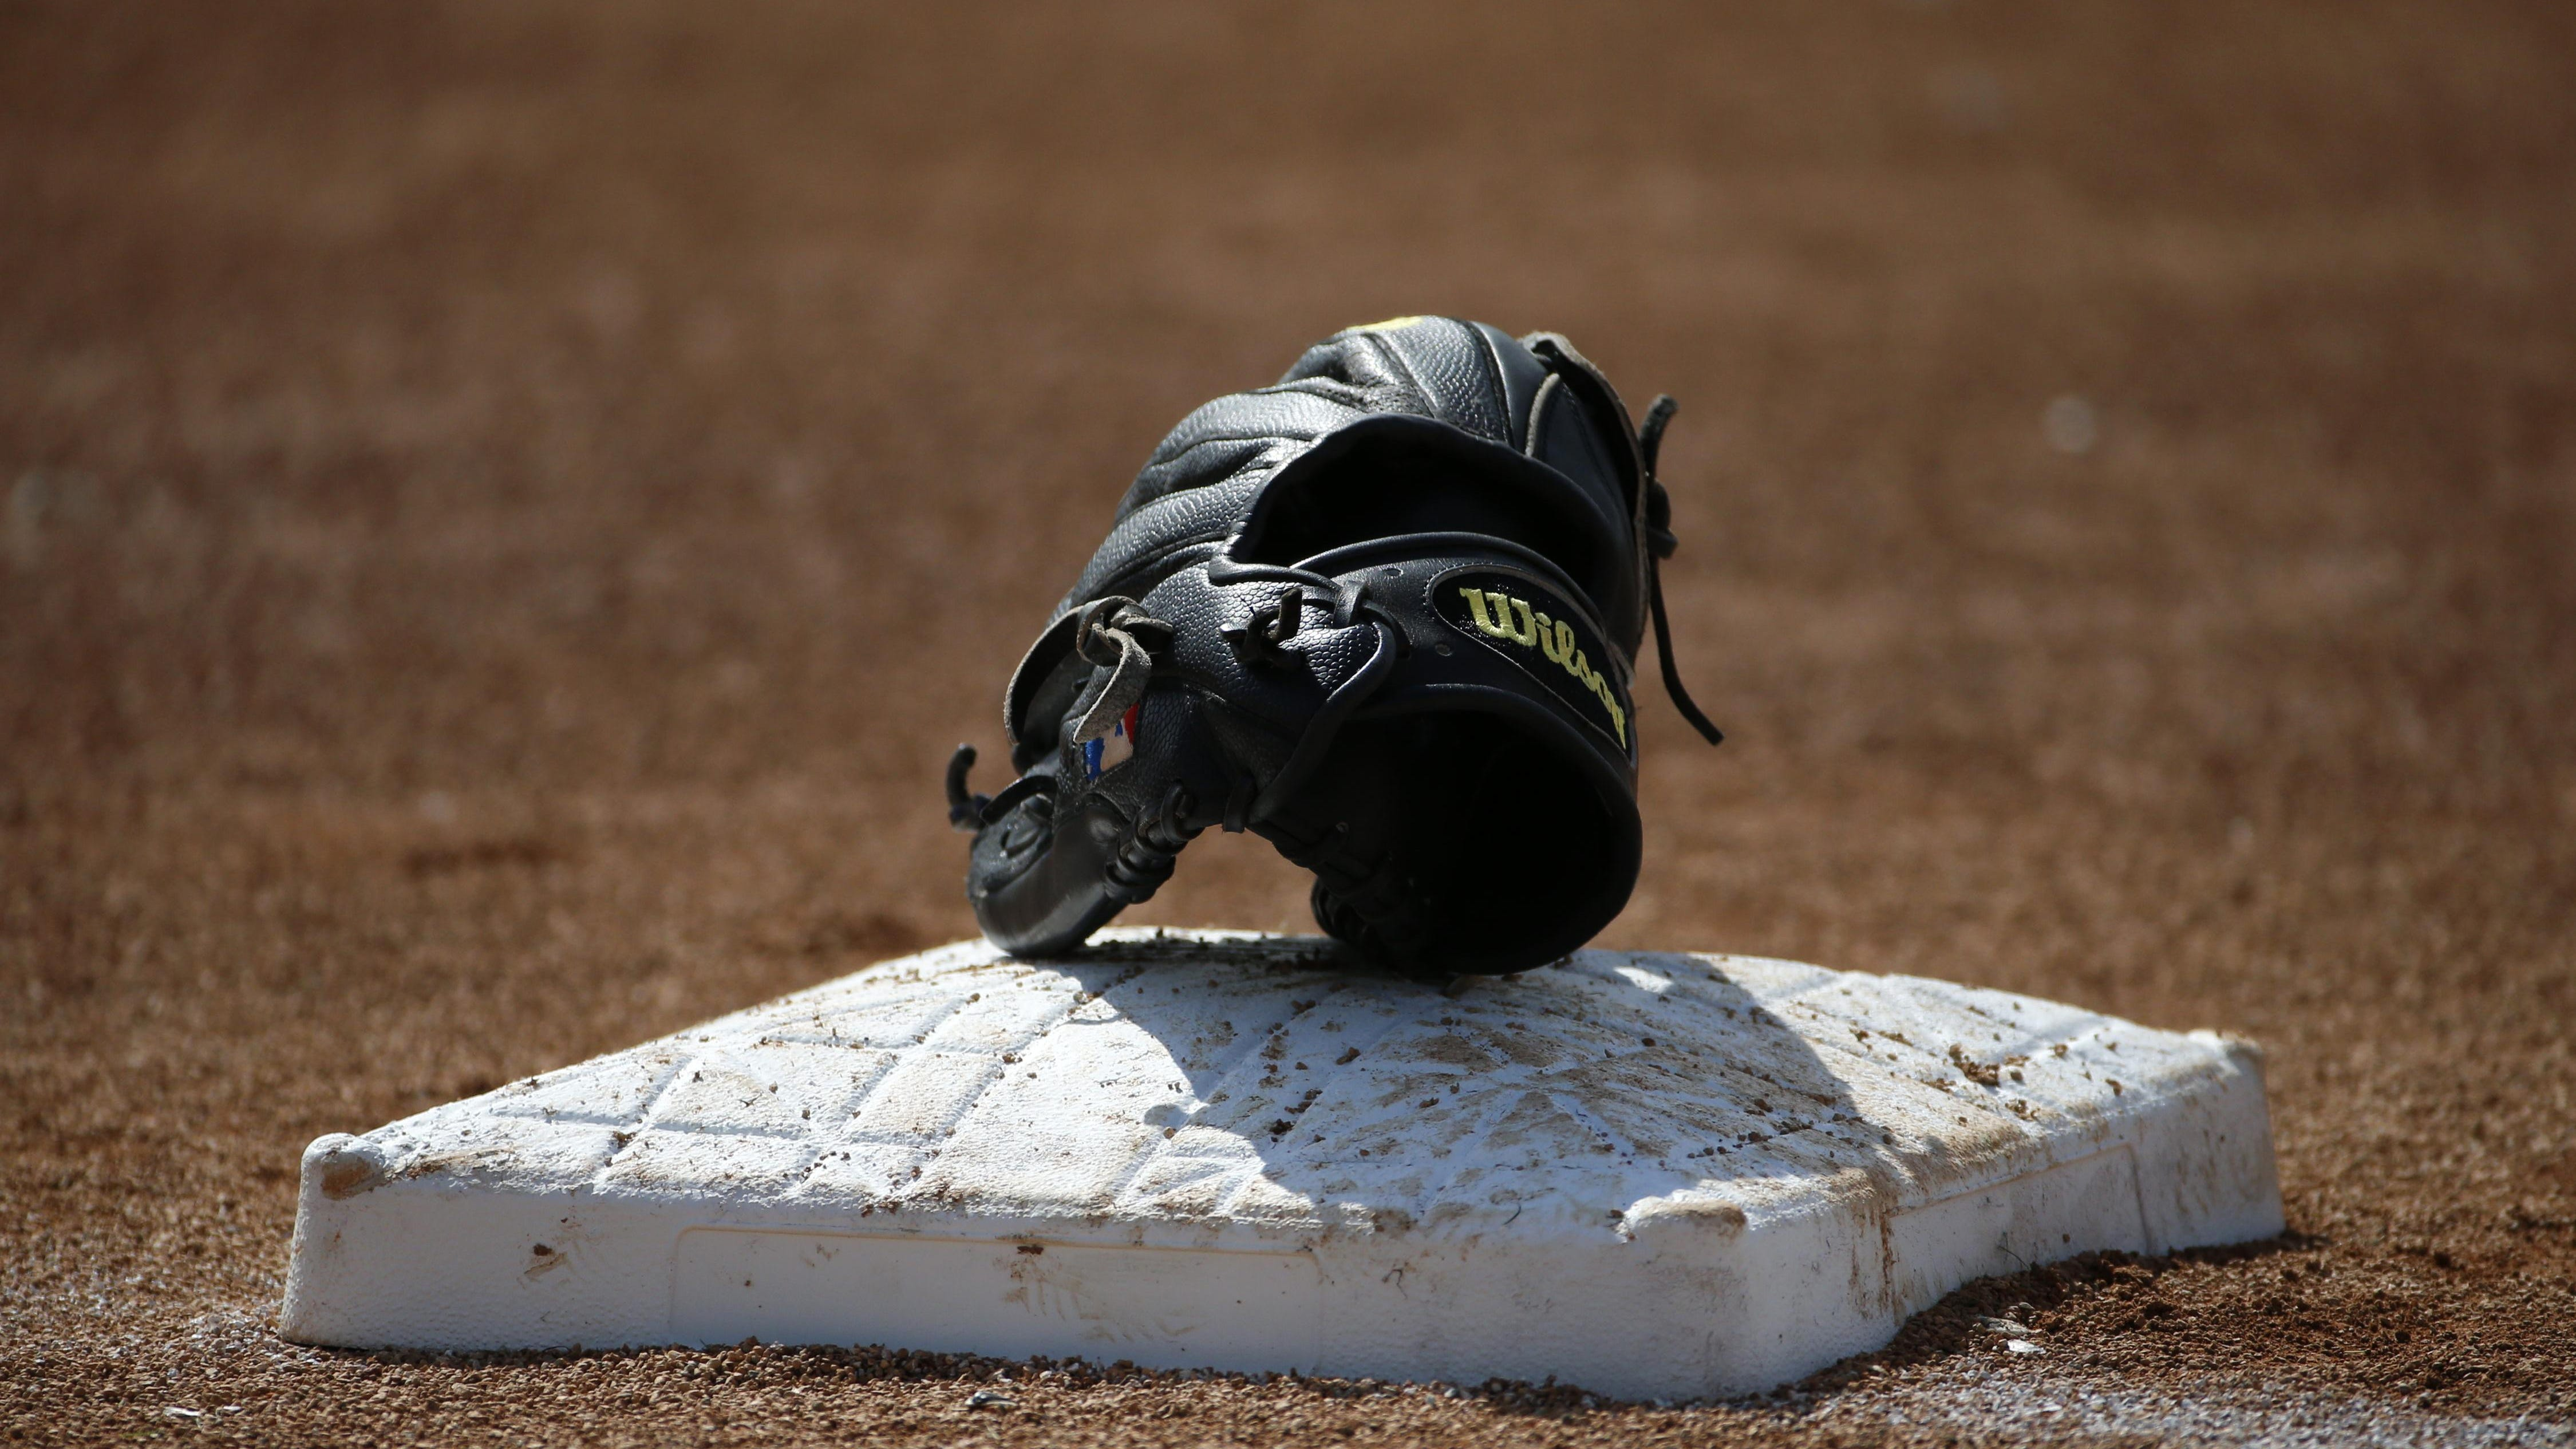 NJ high school sports spring season canceled